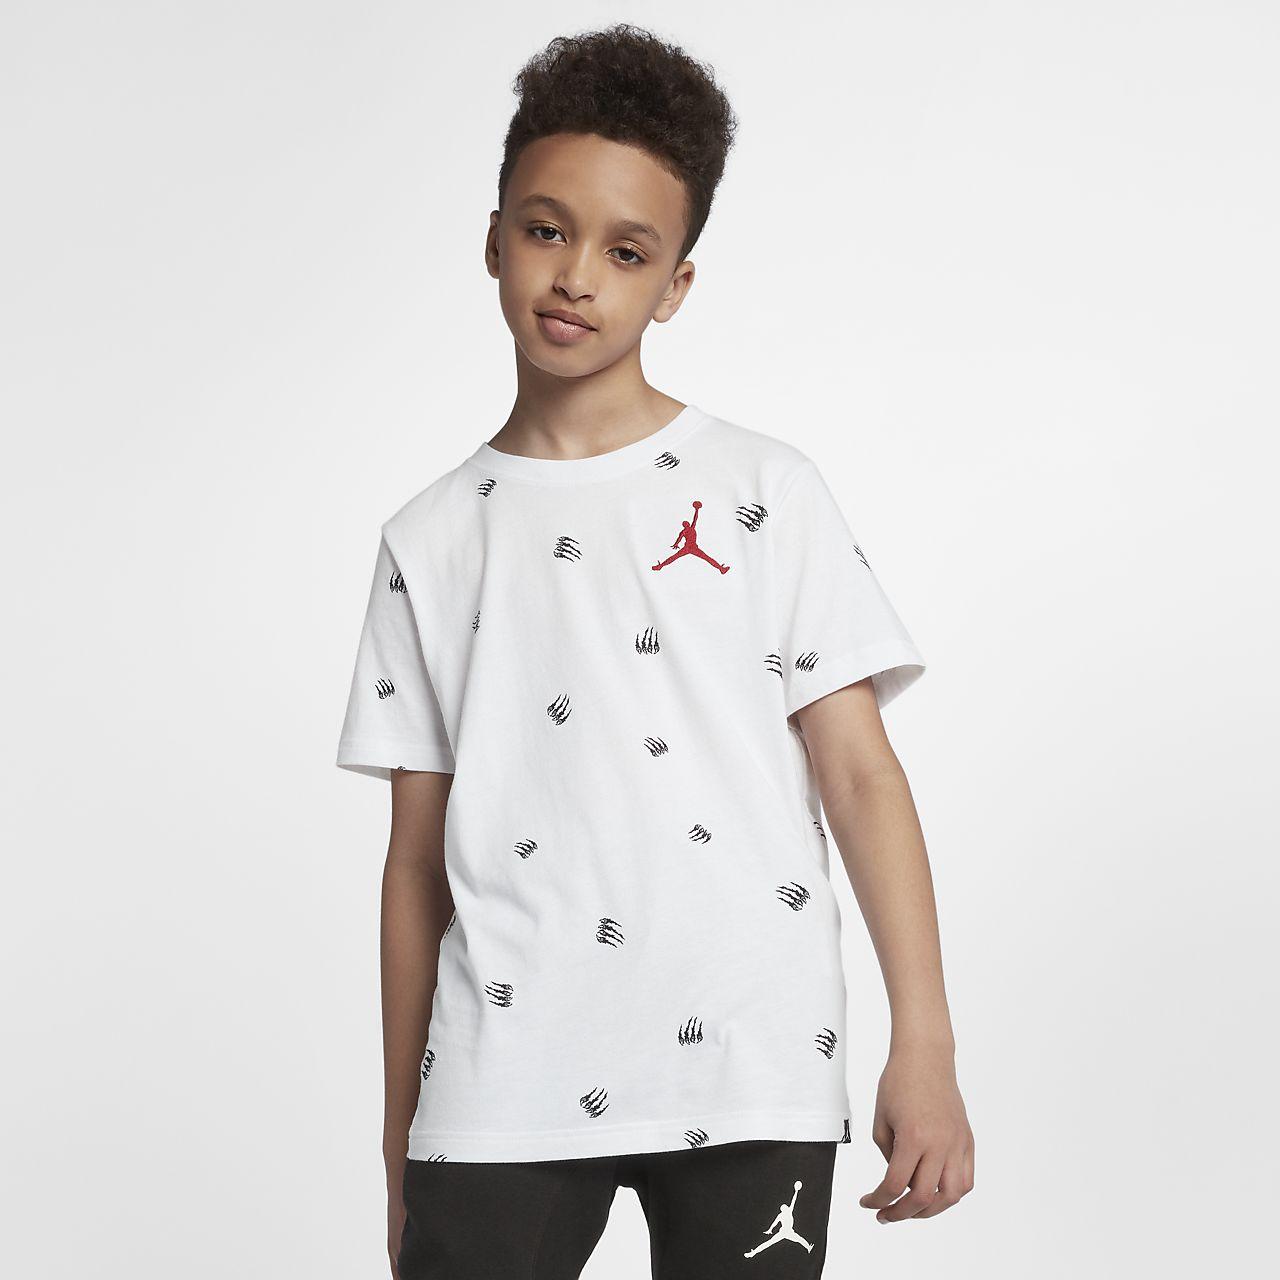 Jordan Sportswear Black Cat Older Kids' (Boys') T-Shirt